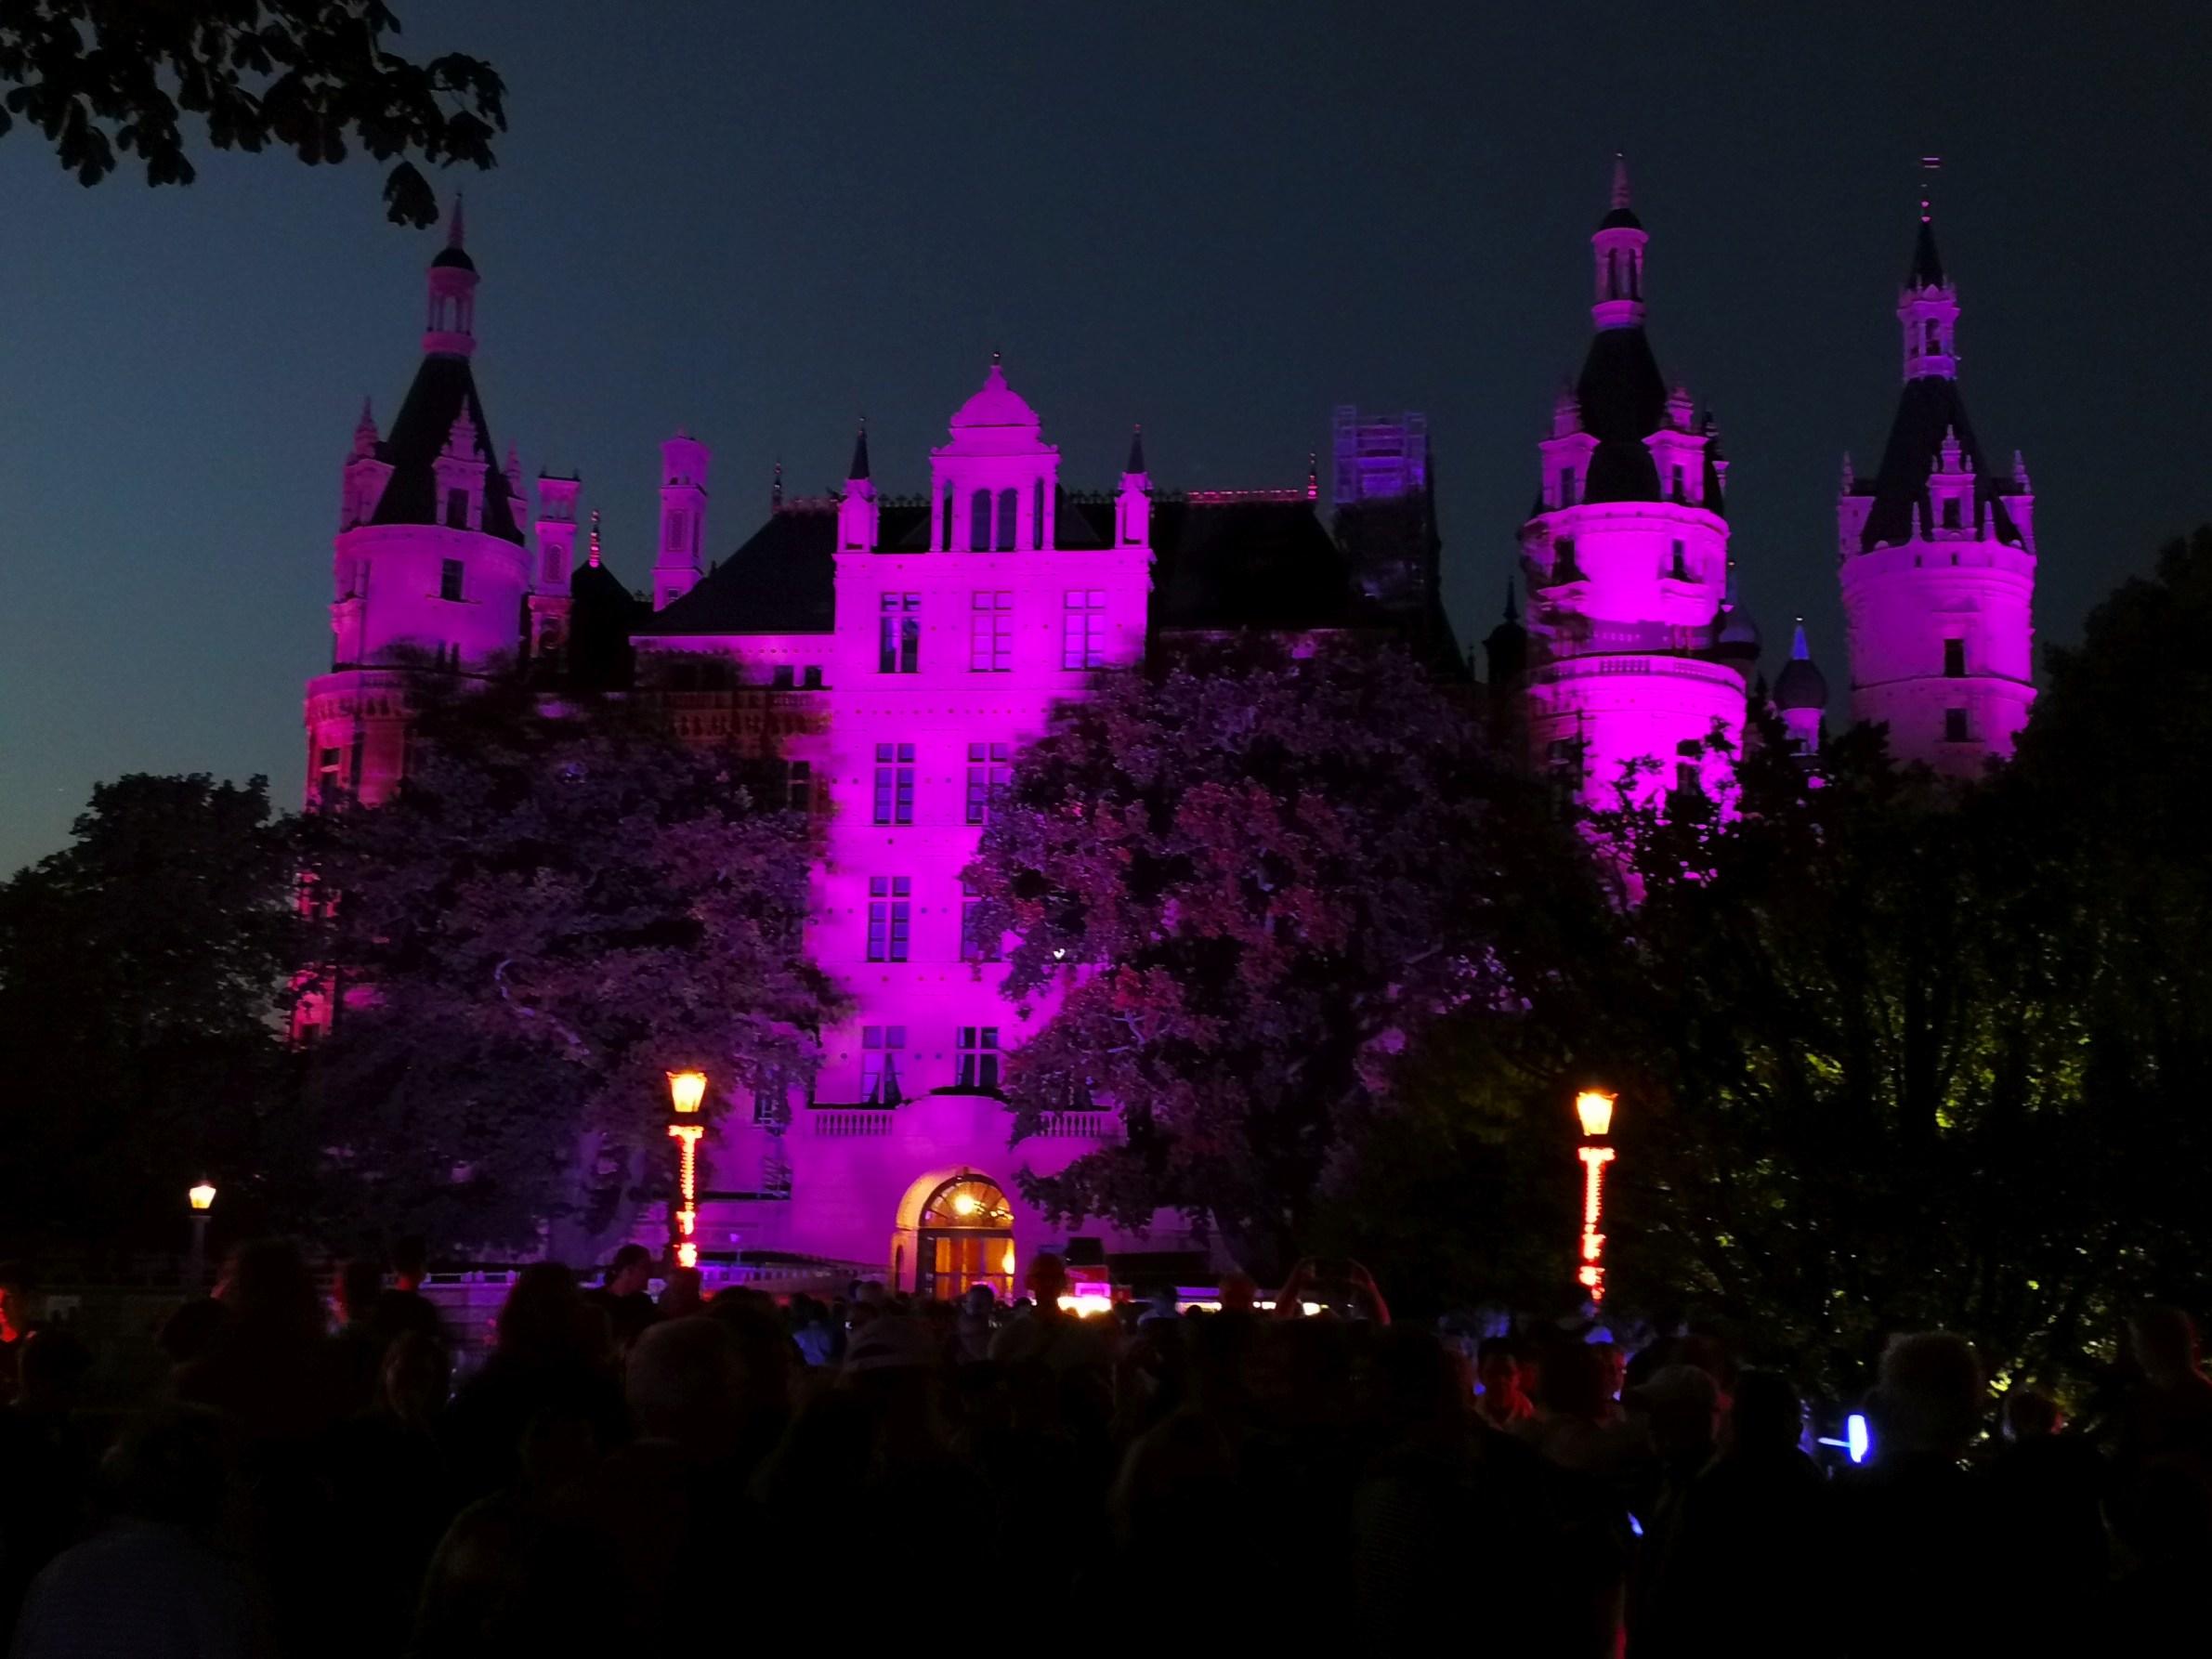 Schlossgartenlust_2019_Schwerinl_IMG_20190803_215942